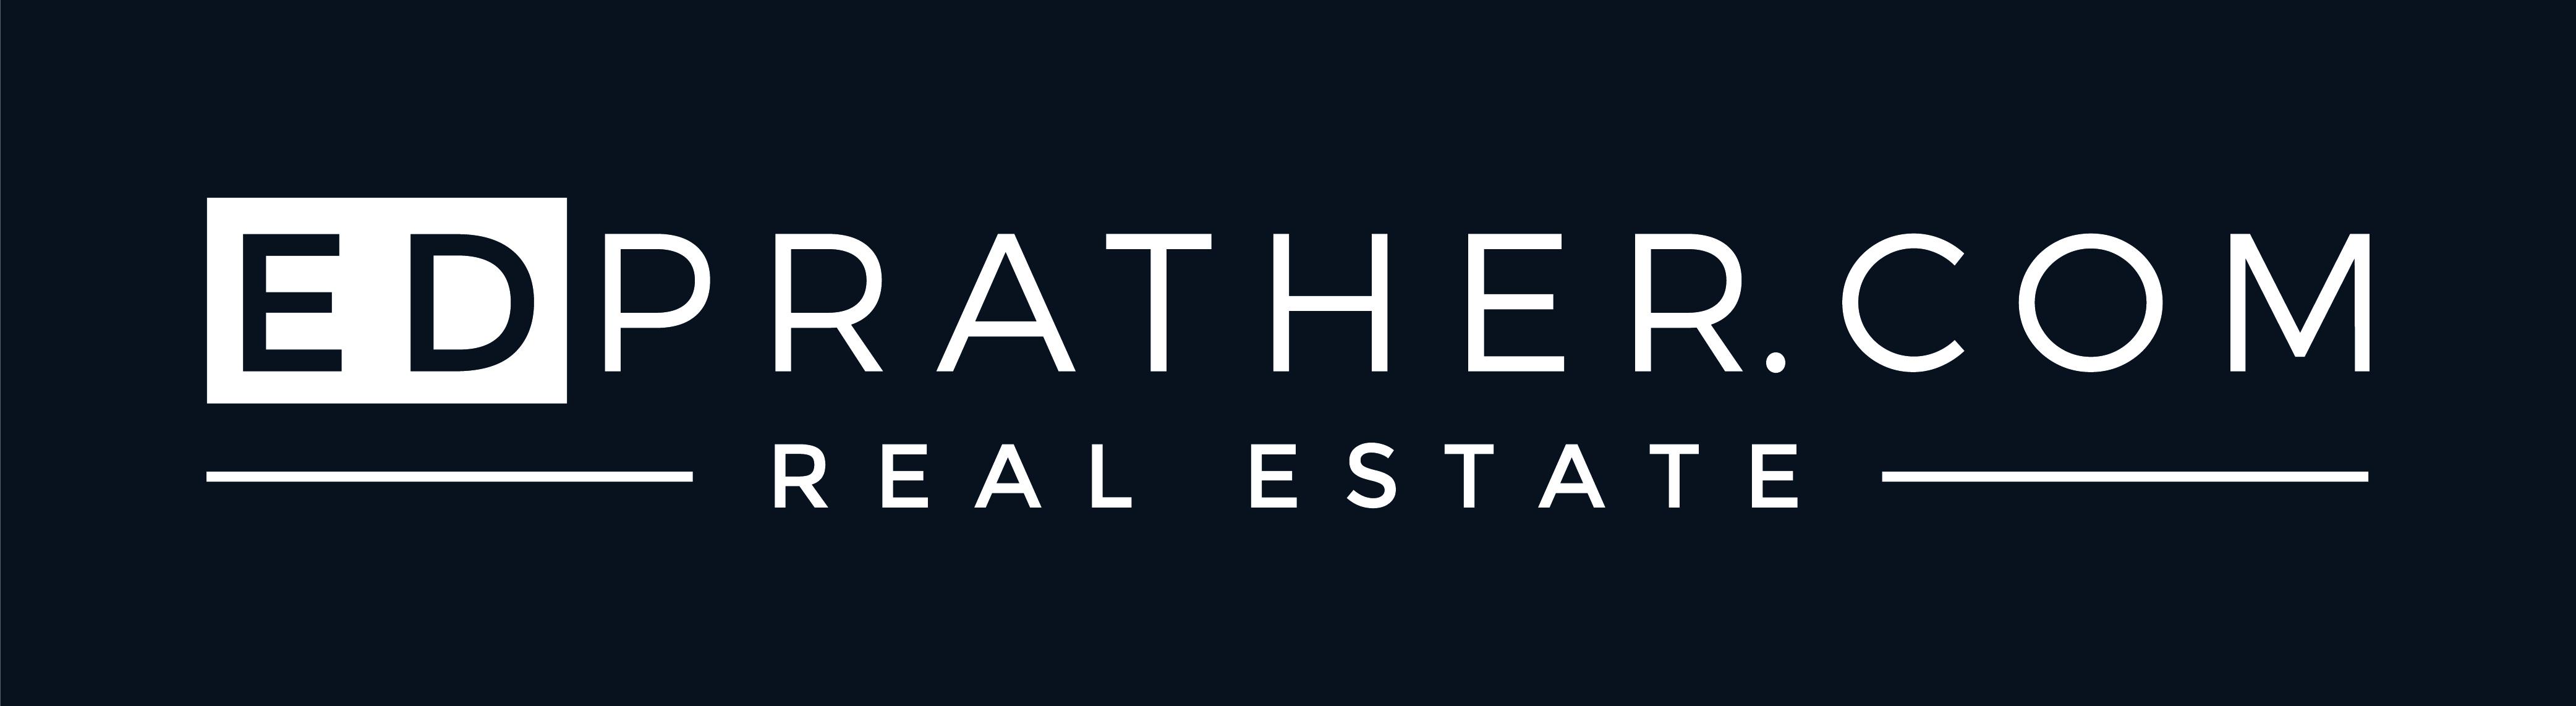 Ed Prather Real Estate logo